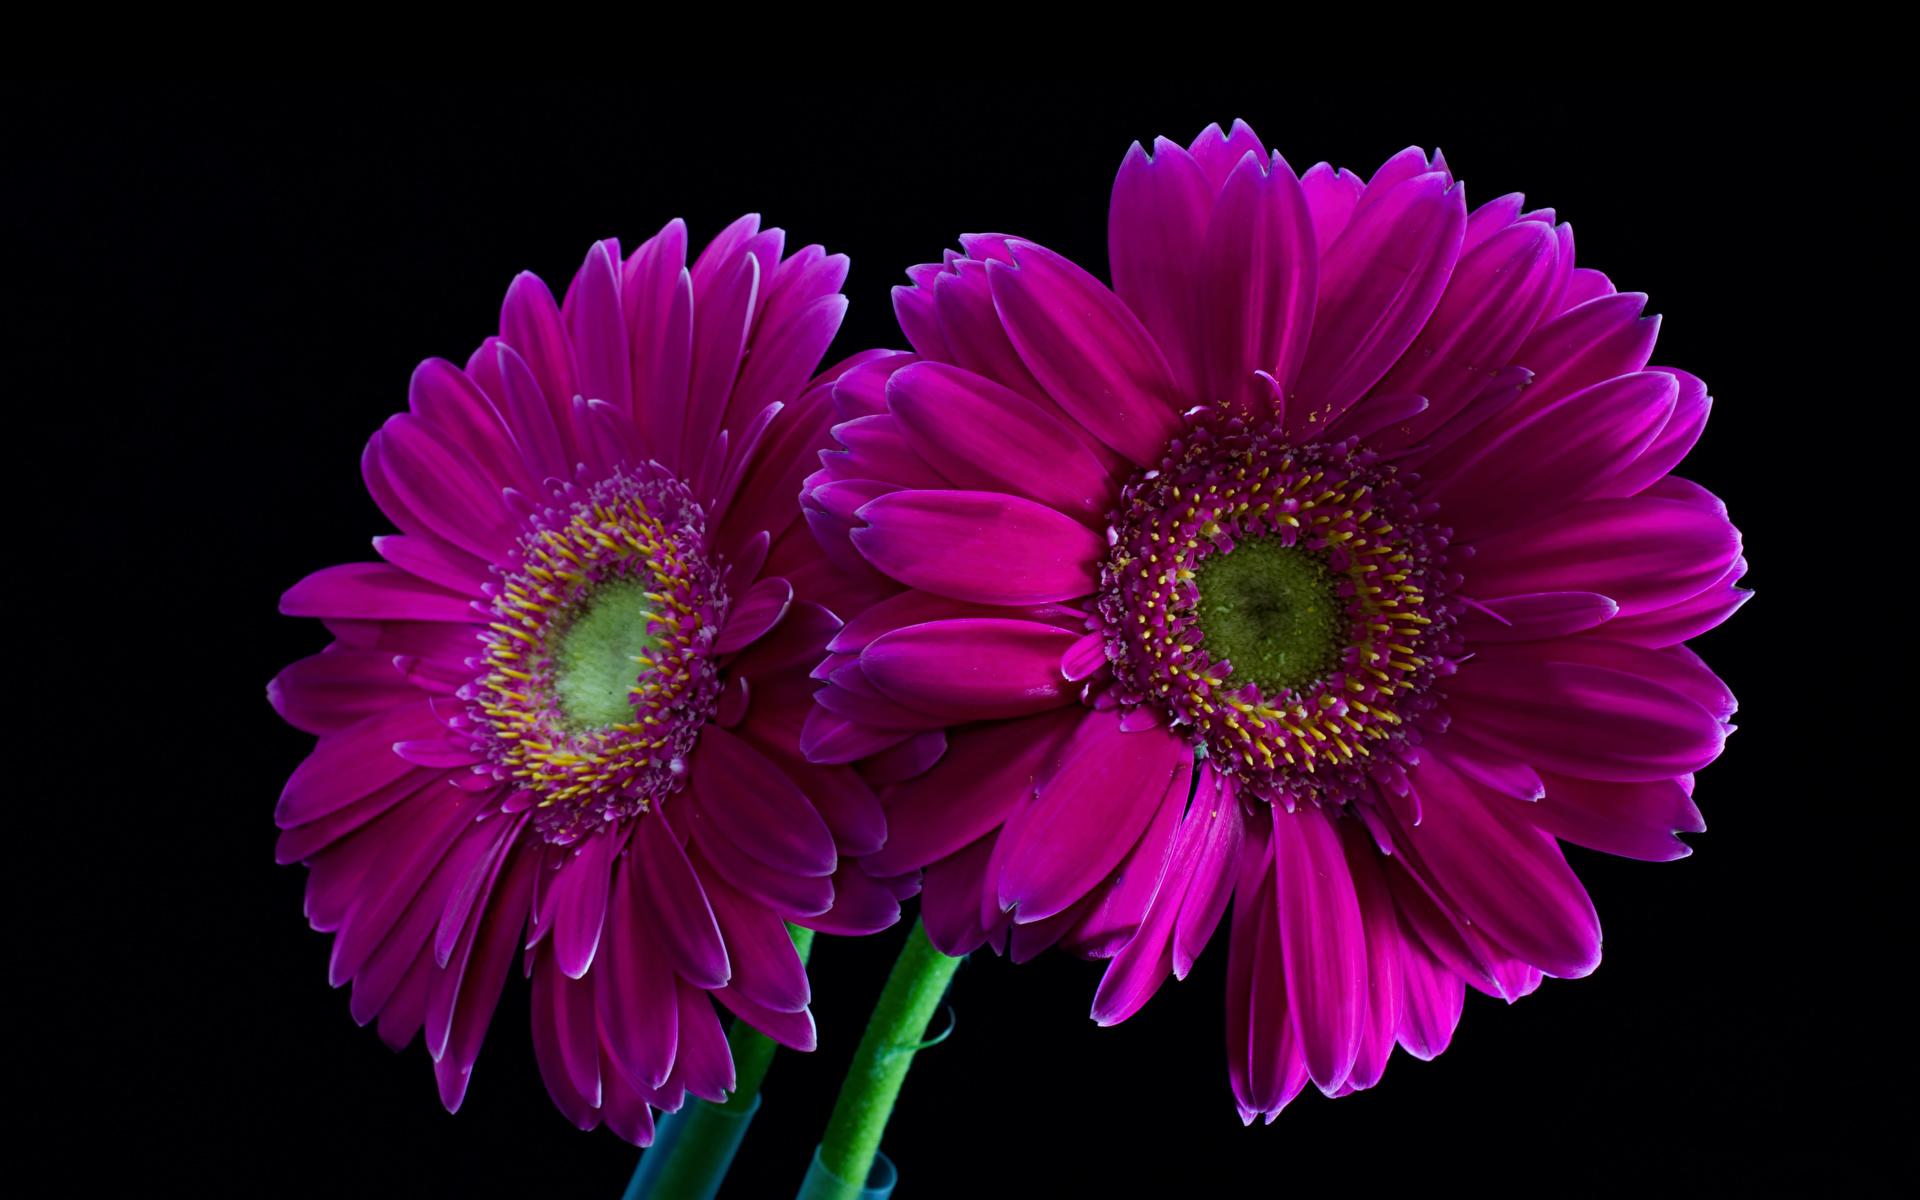 Photo Two Violet Gerberas Flowers Closeup Black background 1920x1200